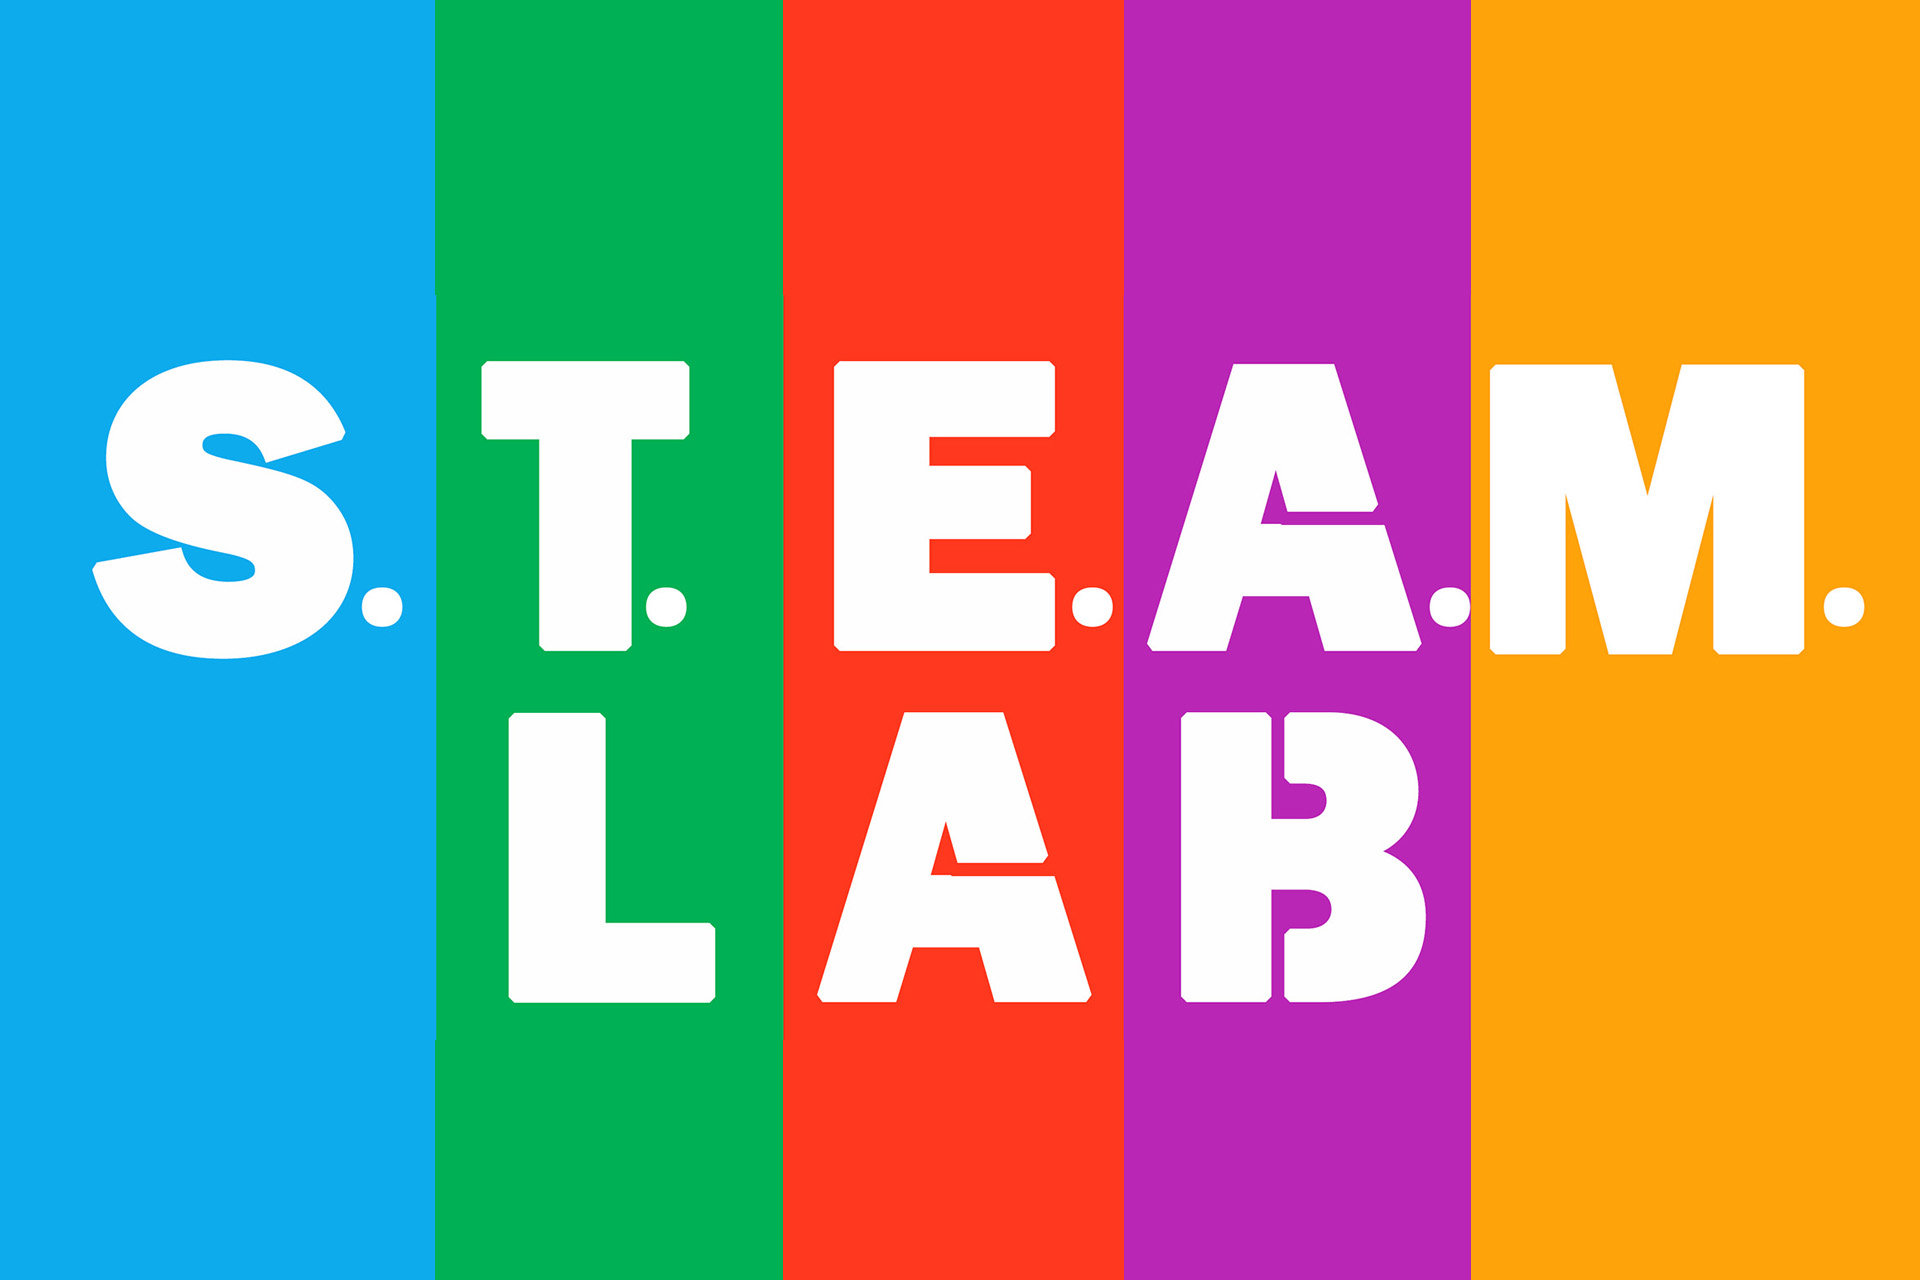 Deerwood S.T.E.A.M. Lab - Tinkercad Workshop